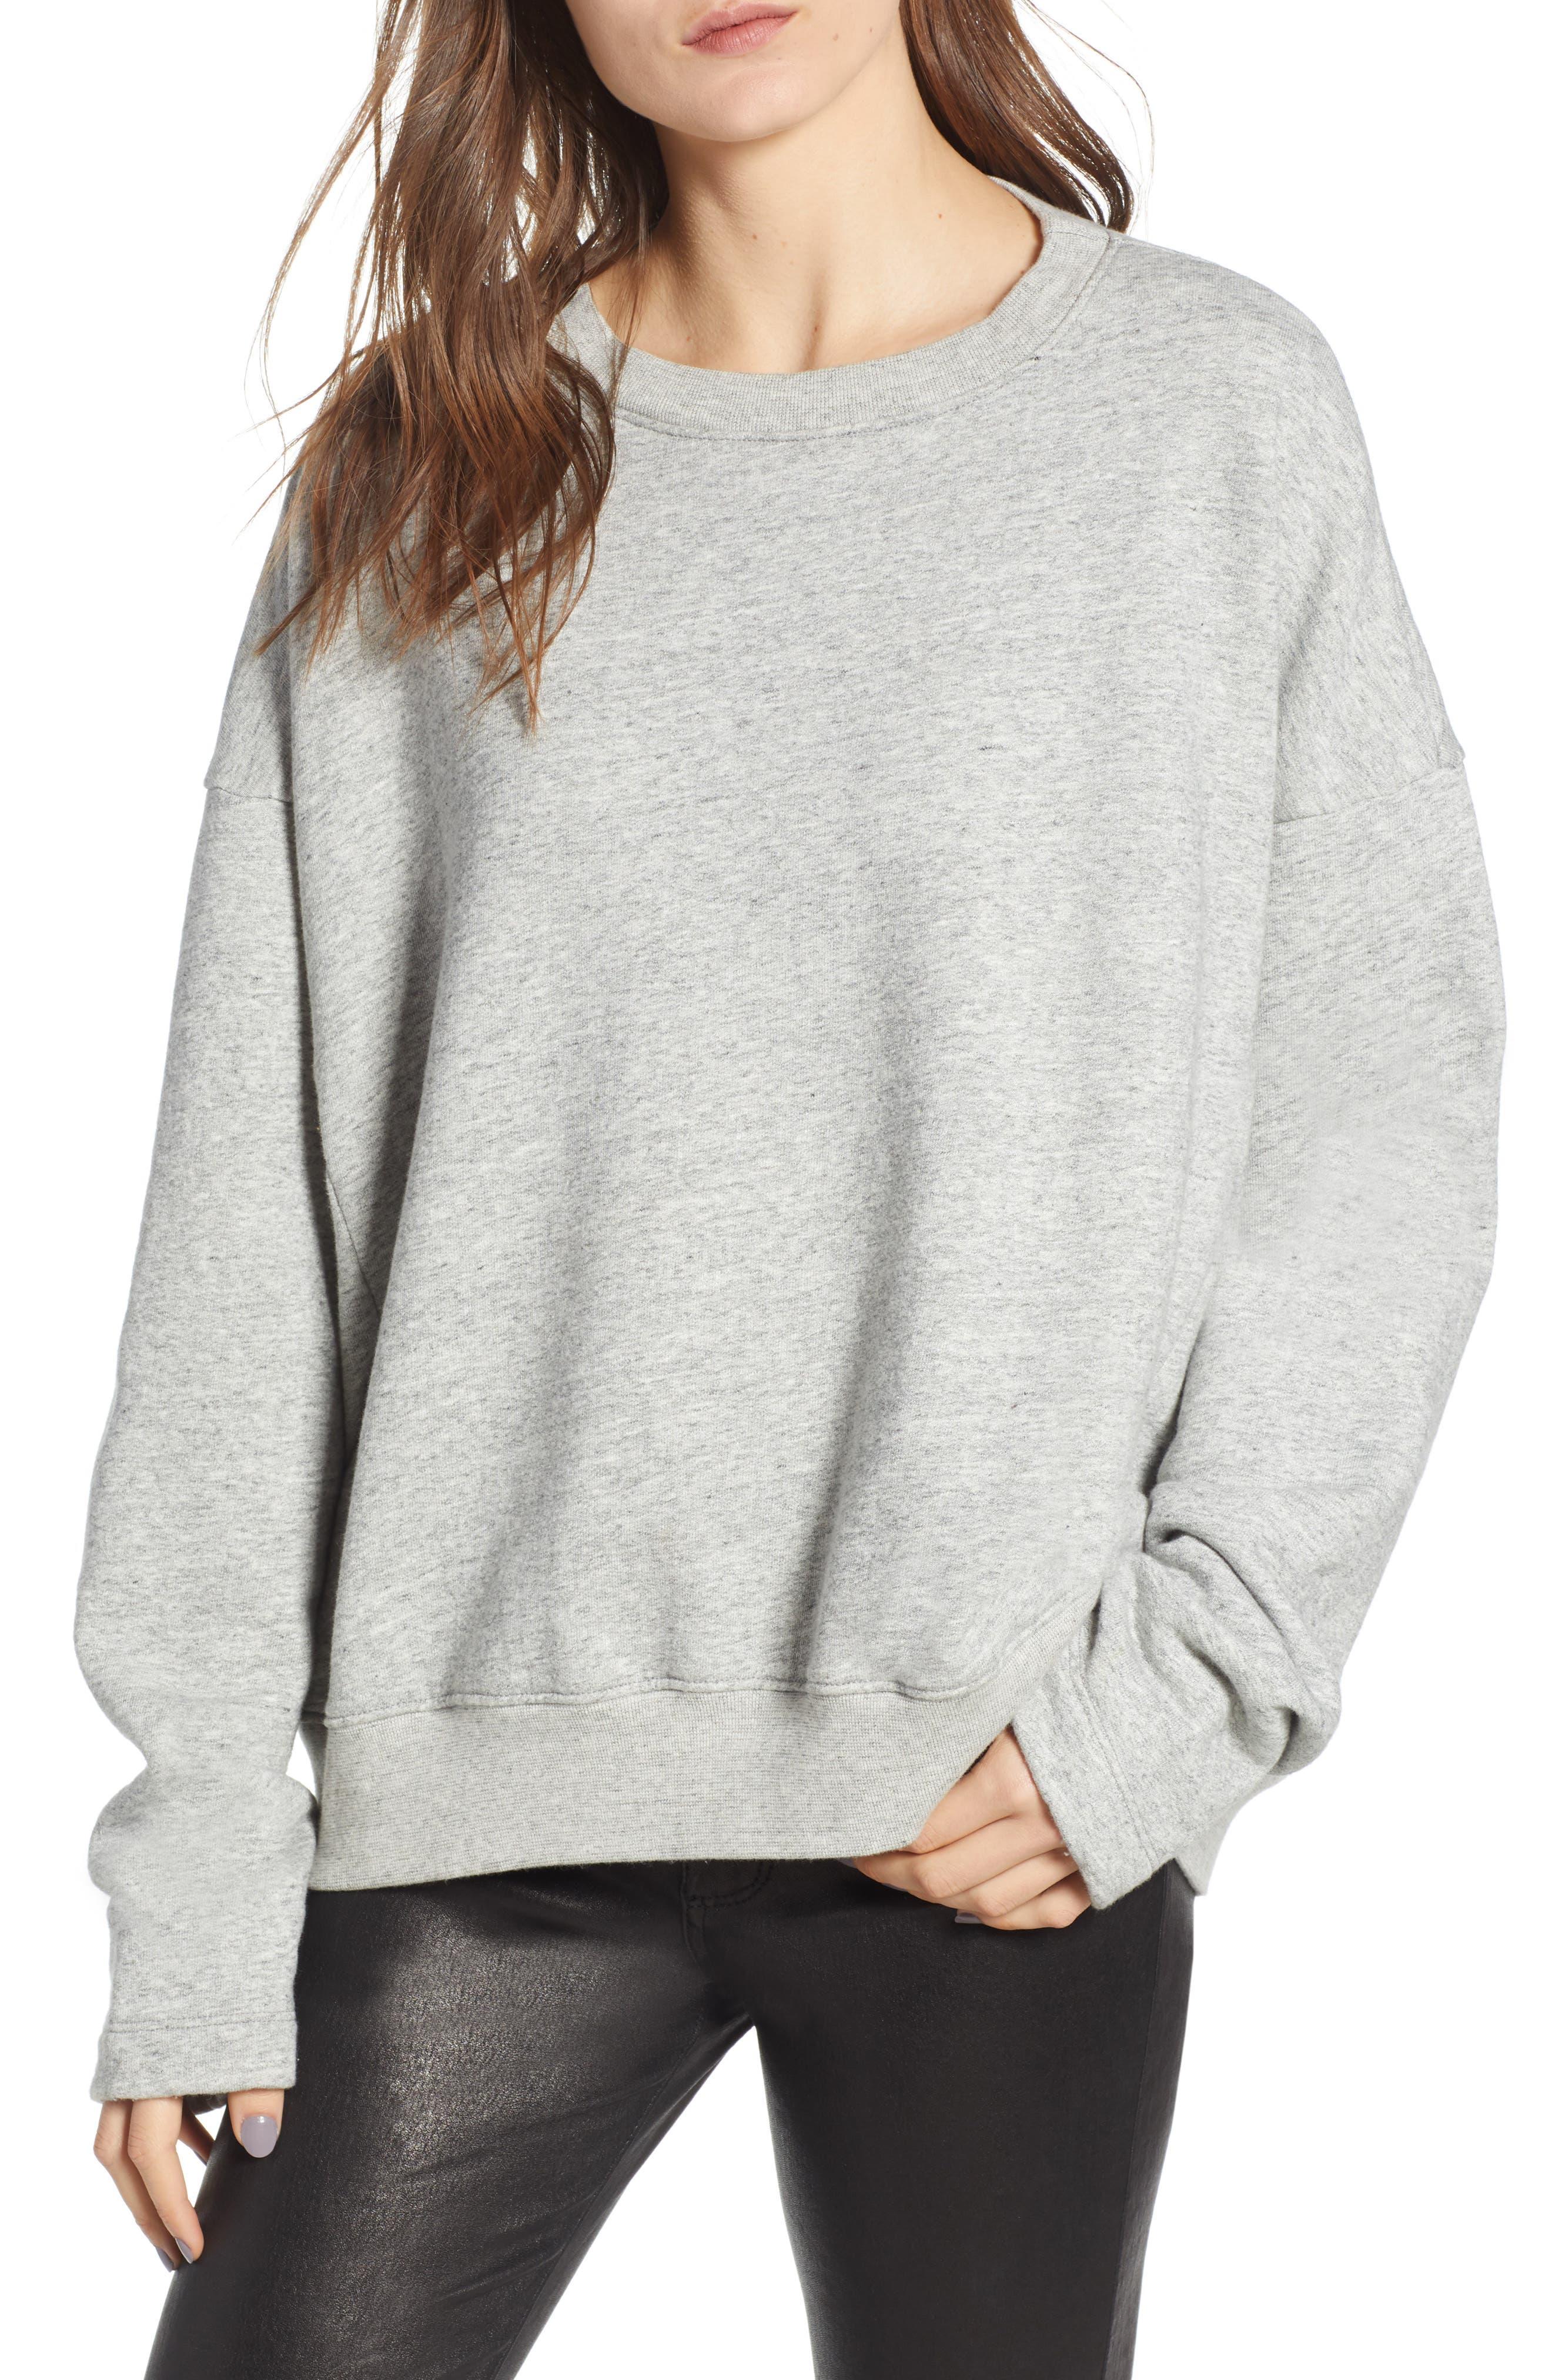 Berdine Oversize Sweatshirt,                             Main thumbnail 1, color,                             HEATHER GREY